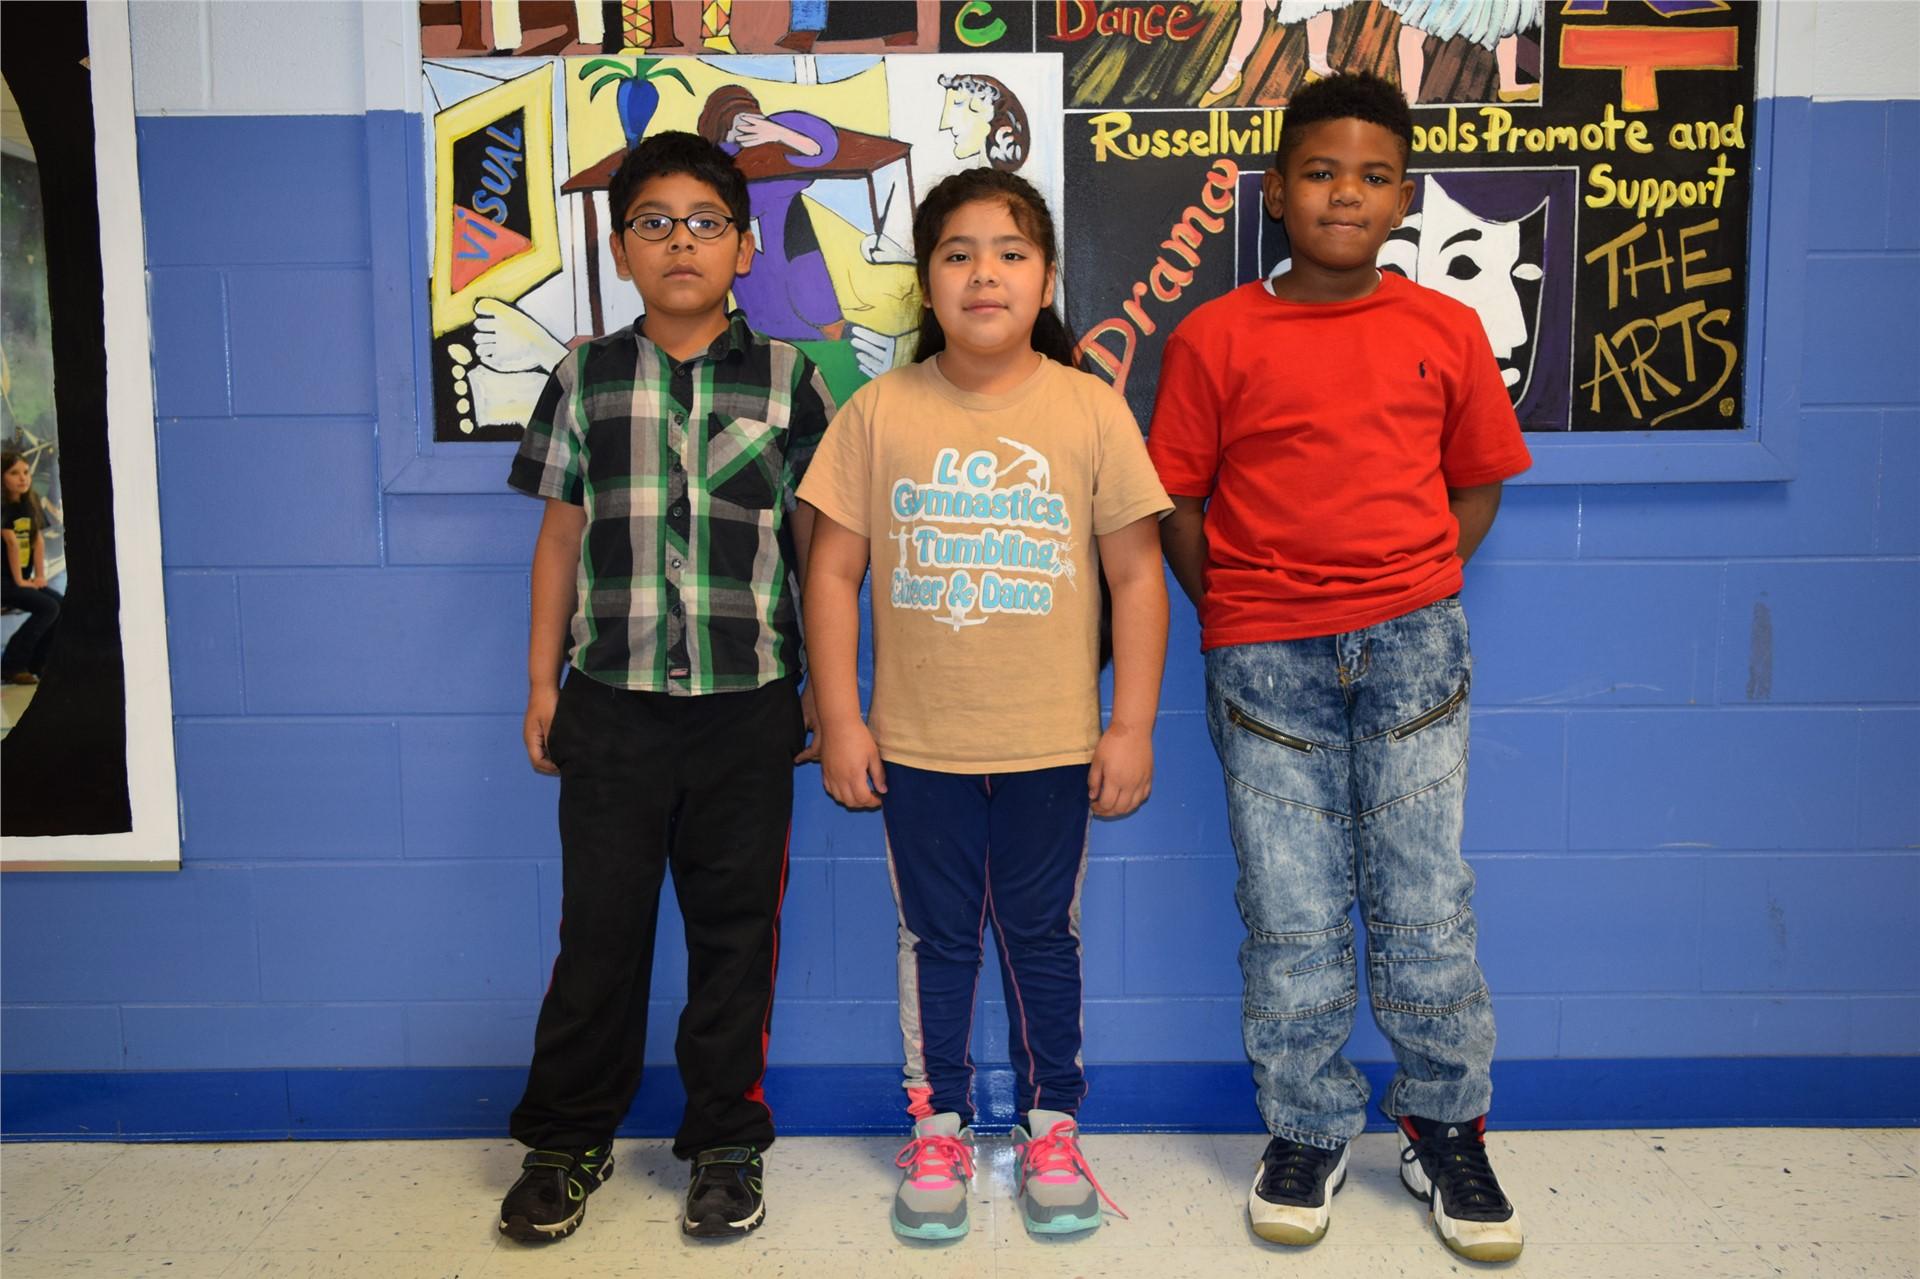 2nd Grade:  Guillermo Perlata Ramirez, Crystal Peralta Ramirez, and Takyon Darden